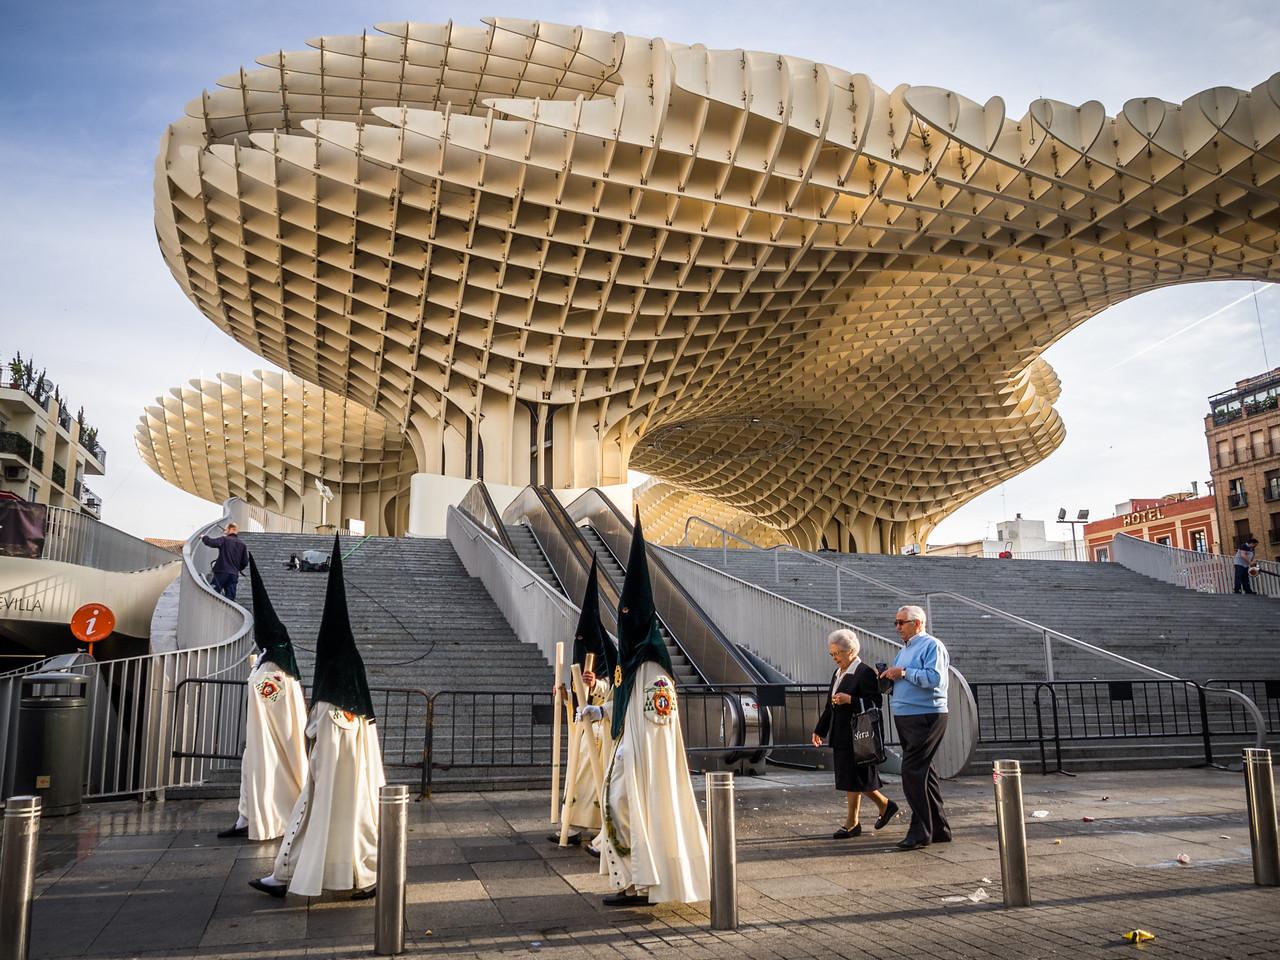 Nazarenos at the Metropol Parasol, Seville, Spain